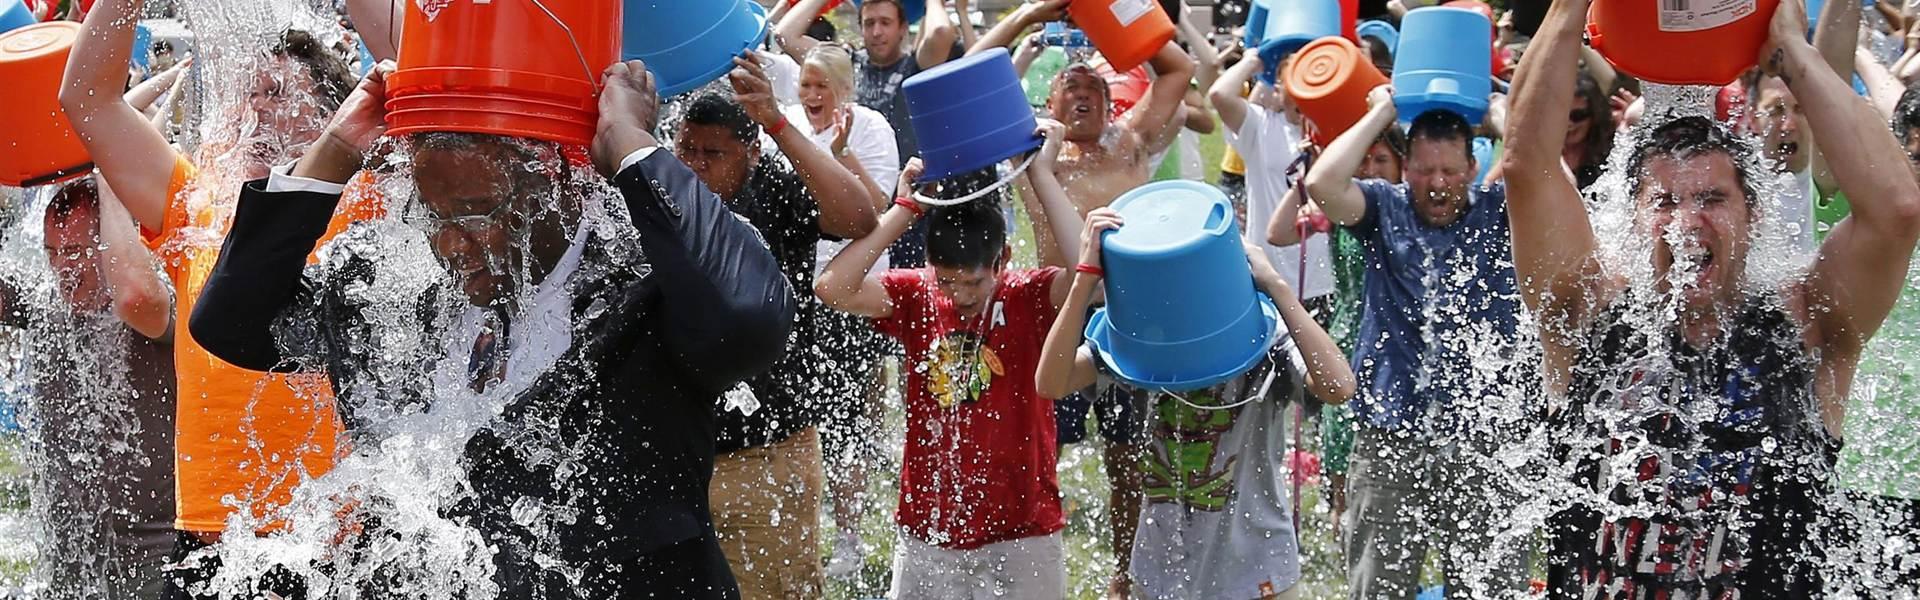 140811-boston-ice-bucket-challenge-1350_26906d39ac7ead702b45e5b7707b8dc6.nbcnews-fp-1920-600.jpg